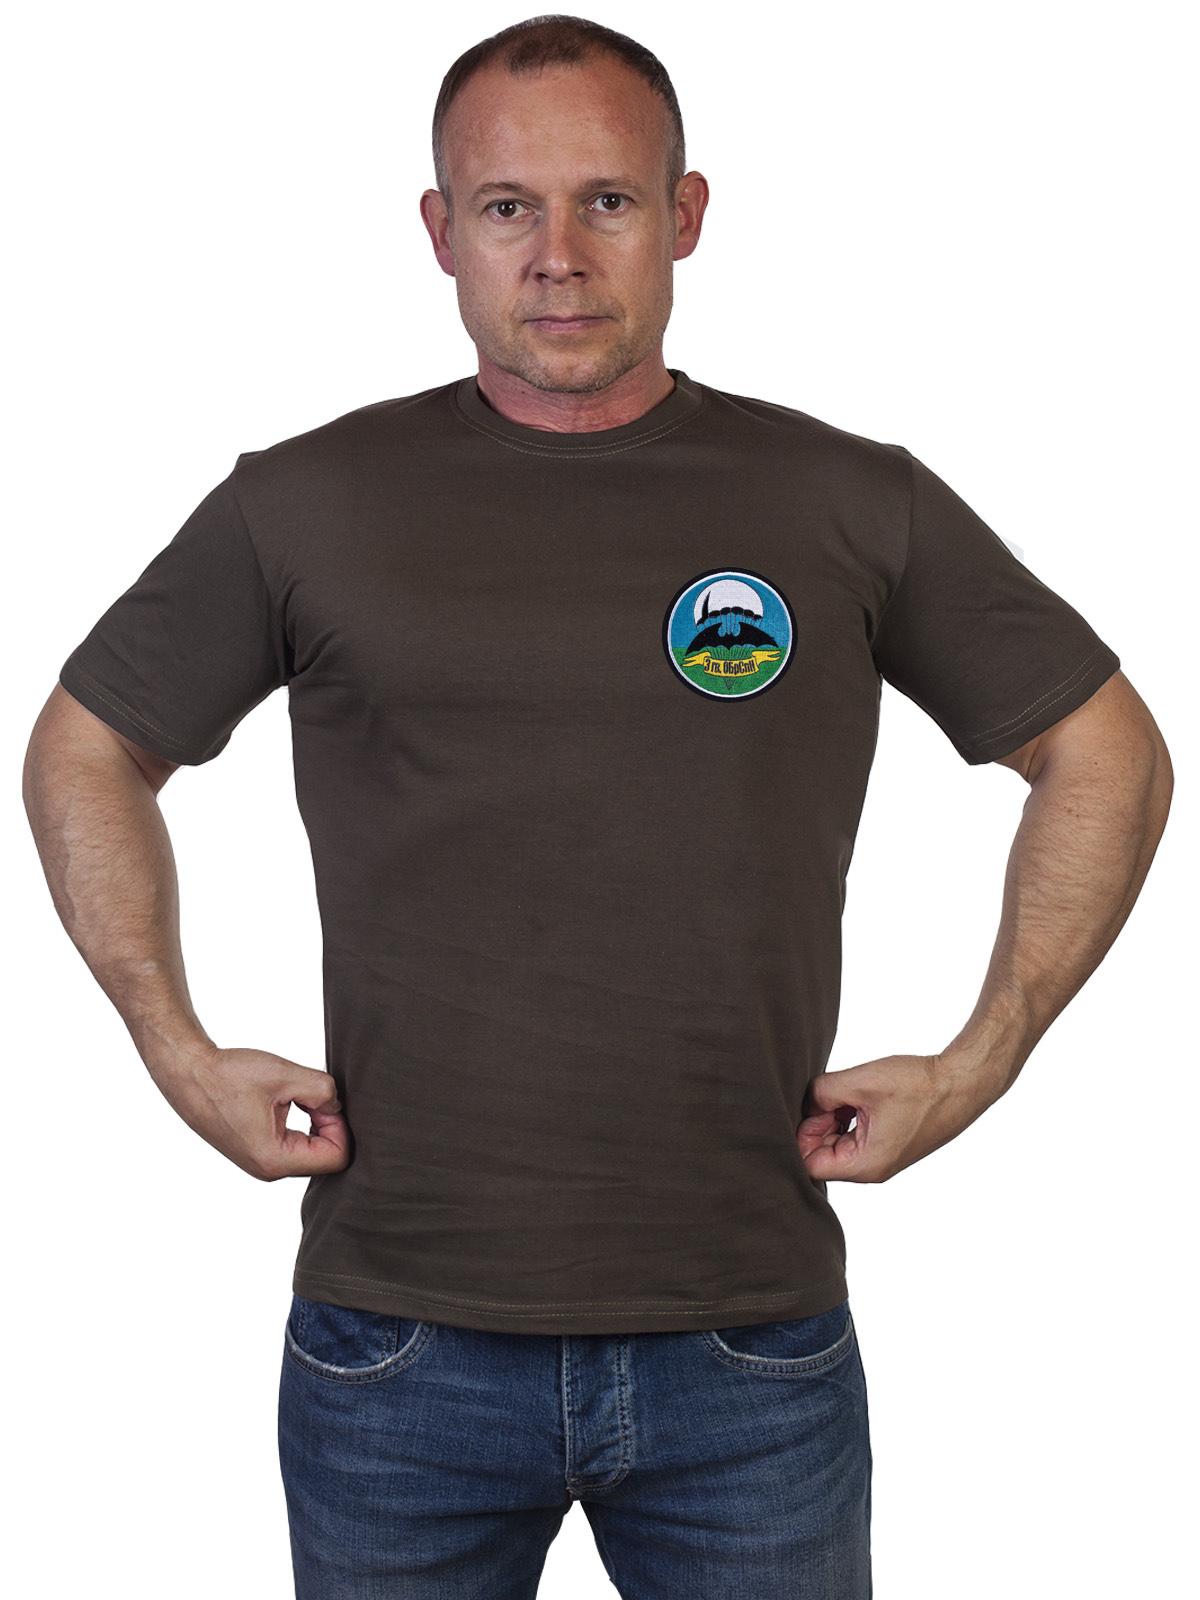 Заказать онлайн мужскую футболку 3 ОБрСпН